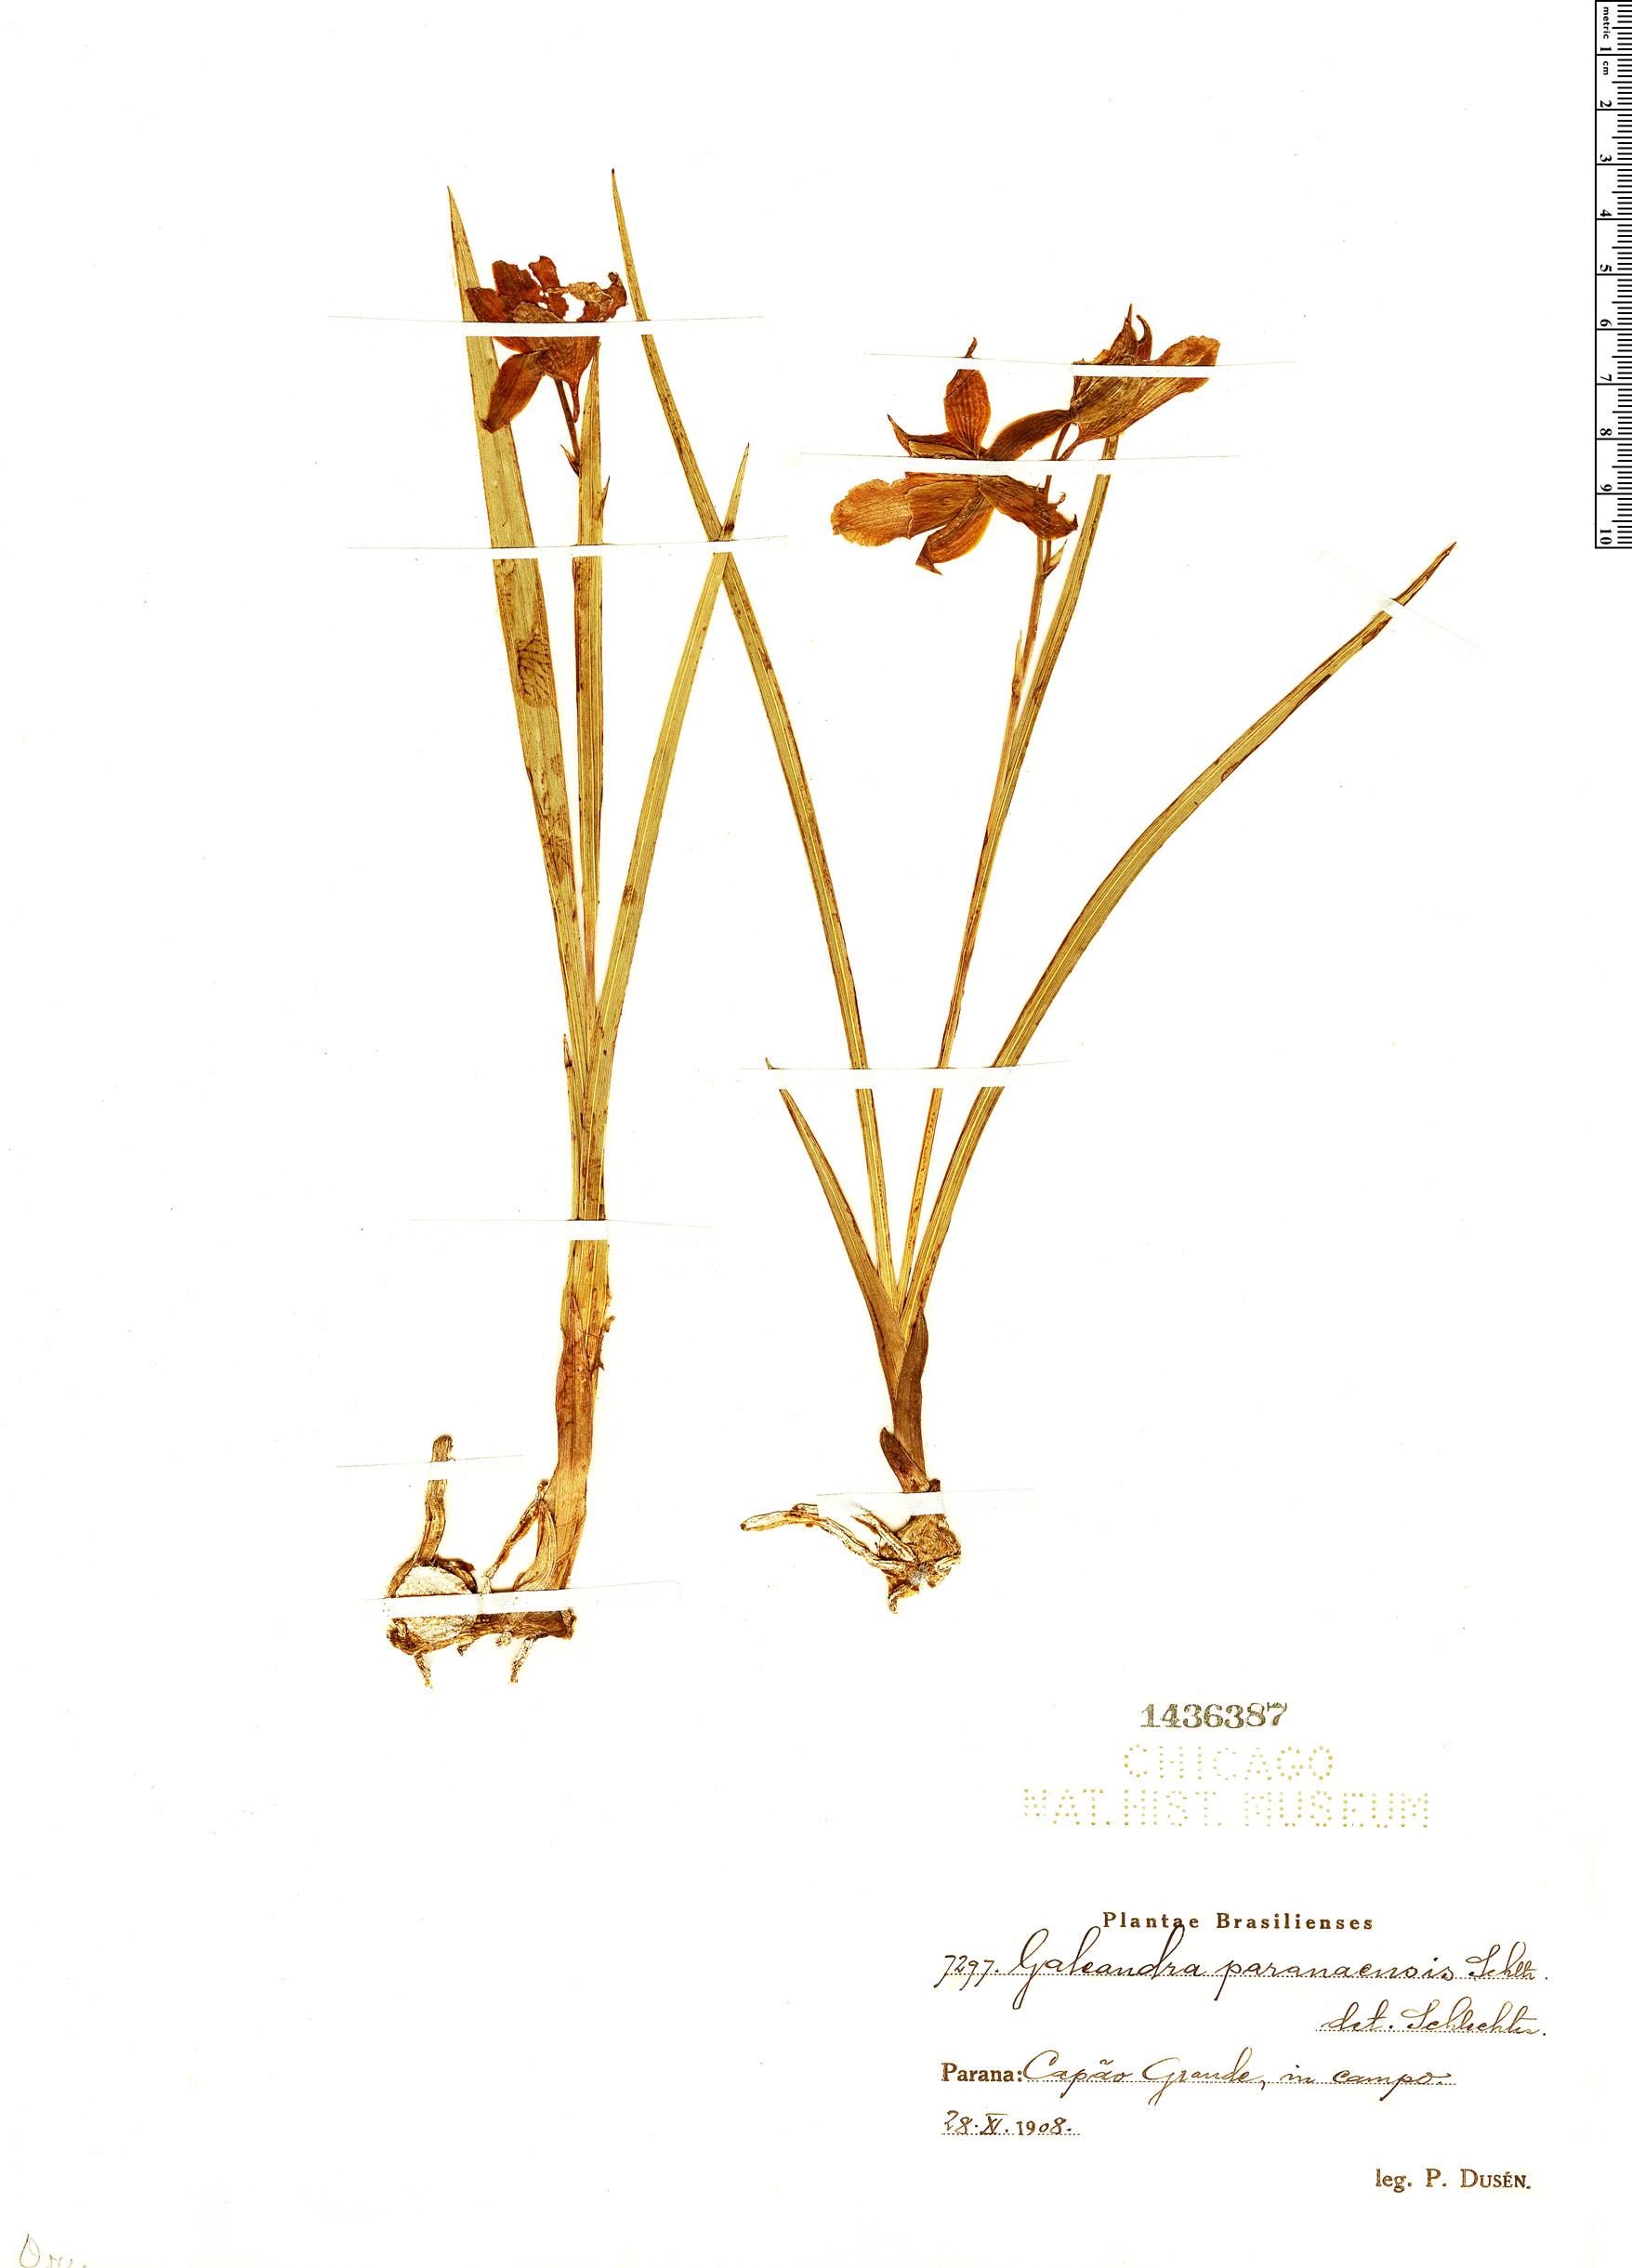 Specimen: Galeandra paraguayensis